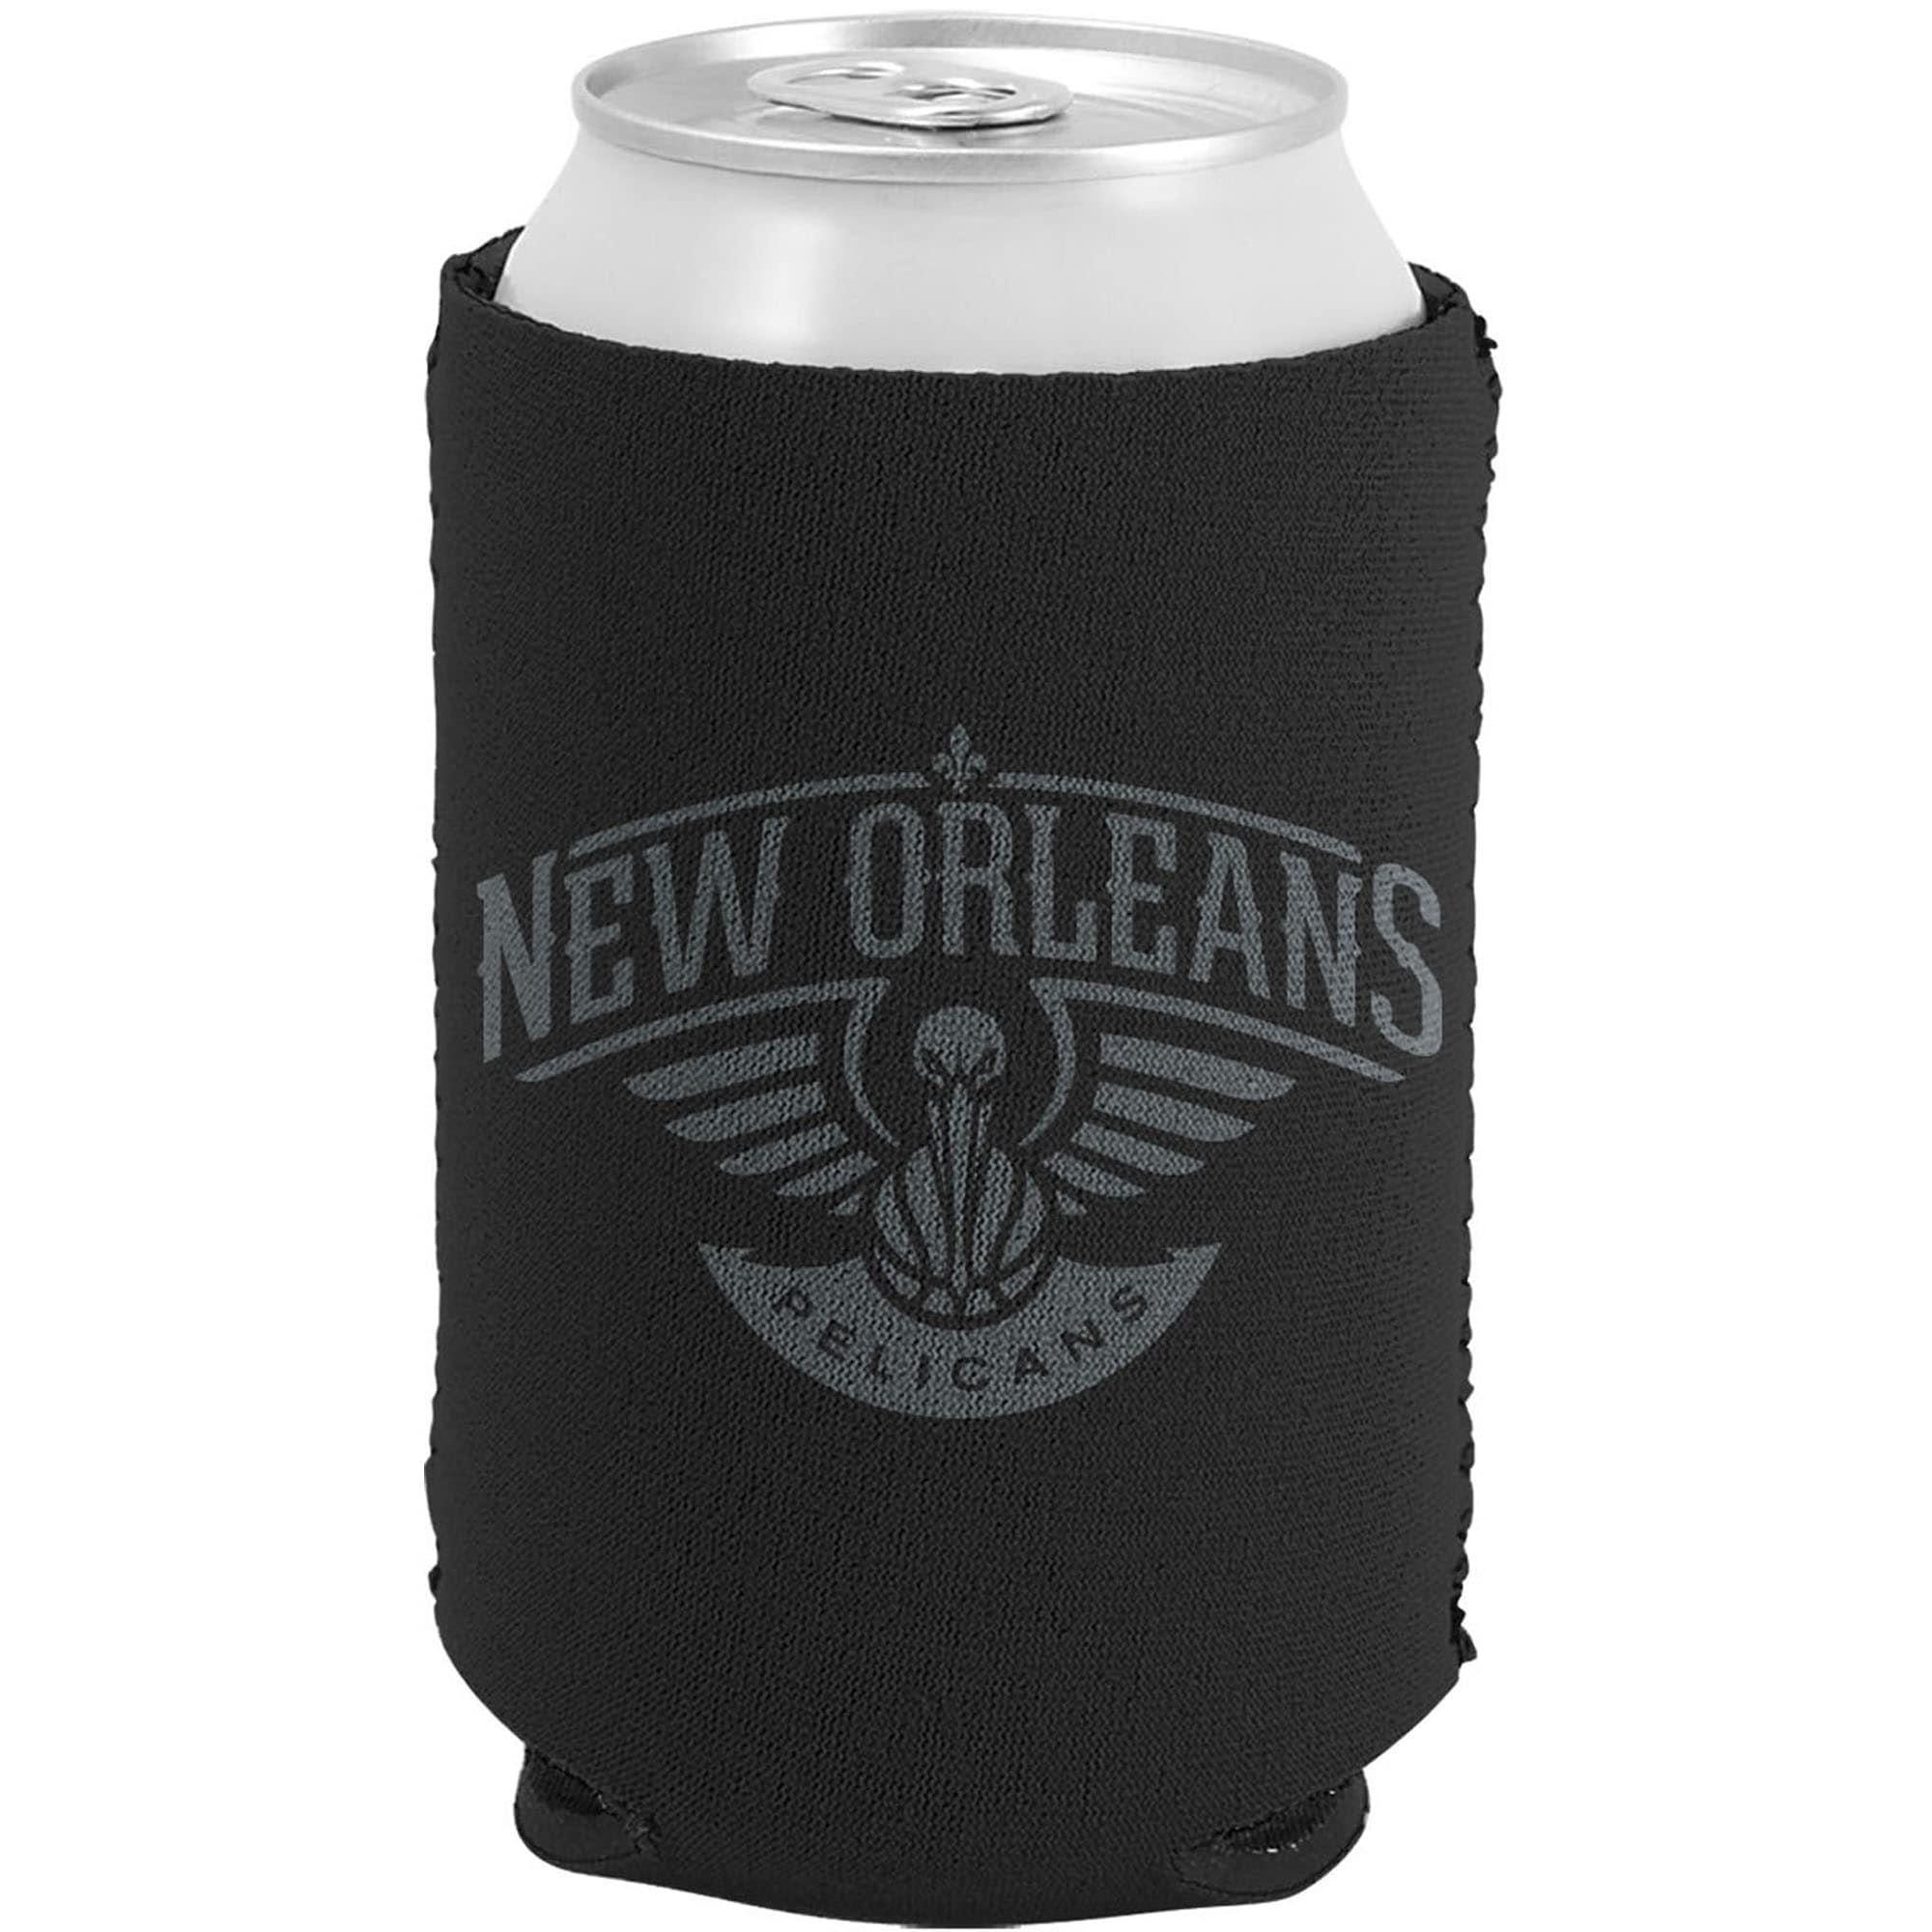 New Orleans Pelicans 12oz. Tonal Can Cooler